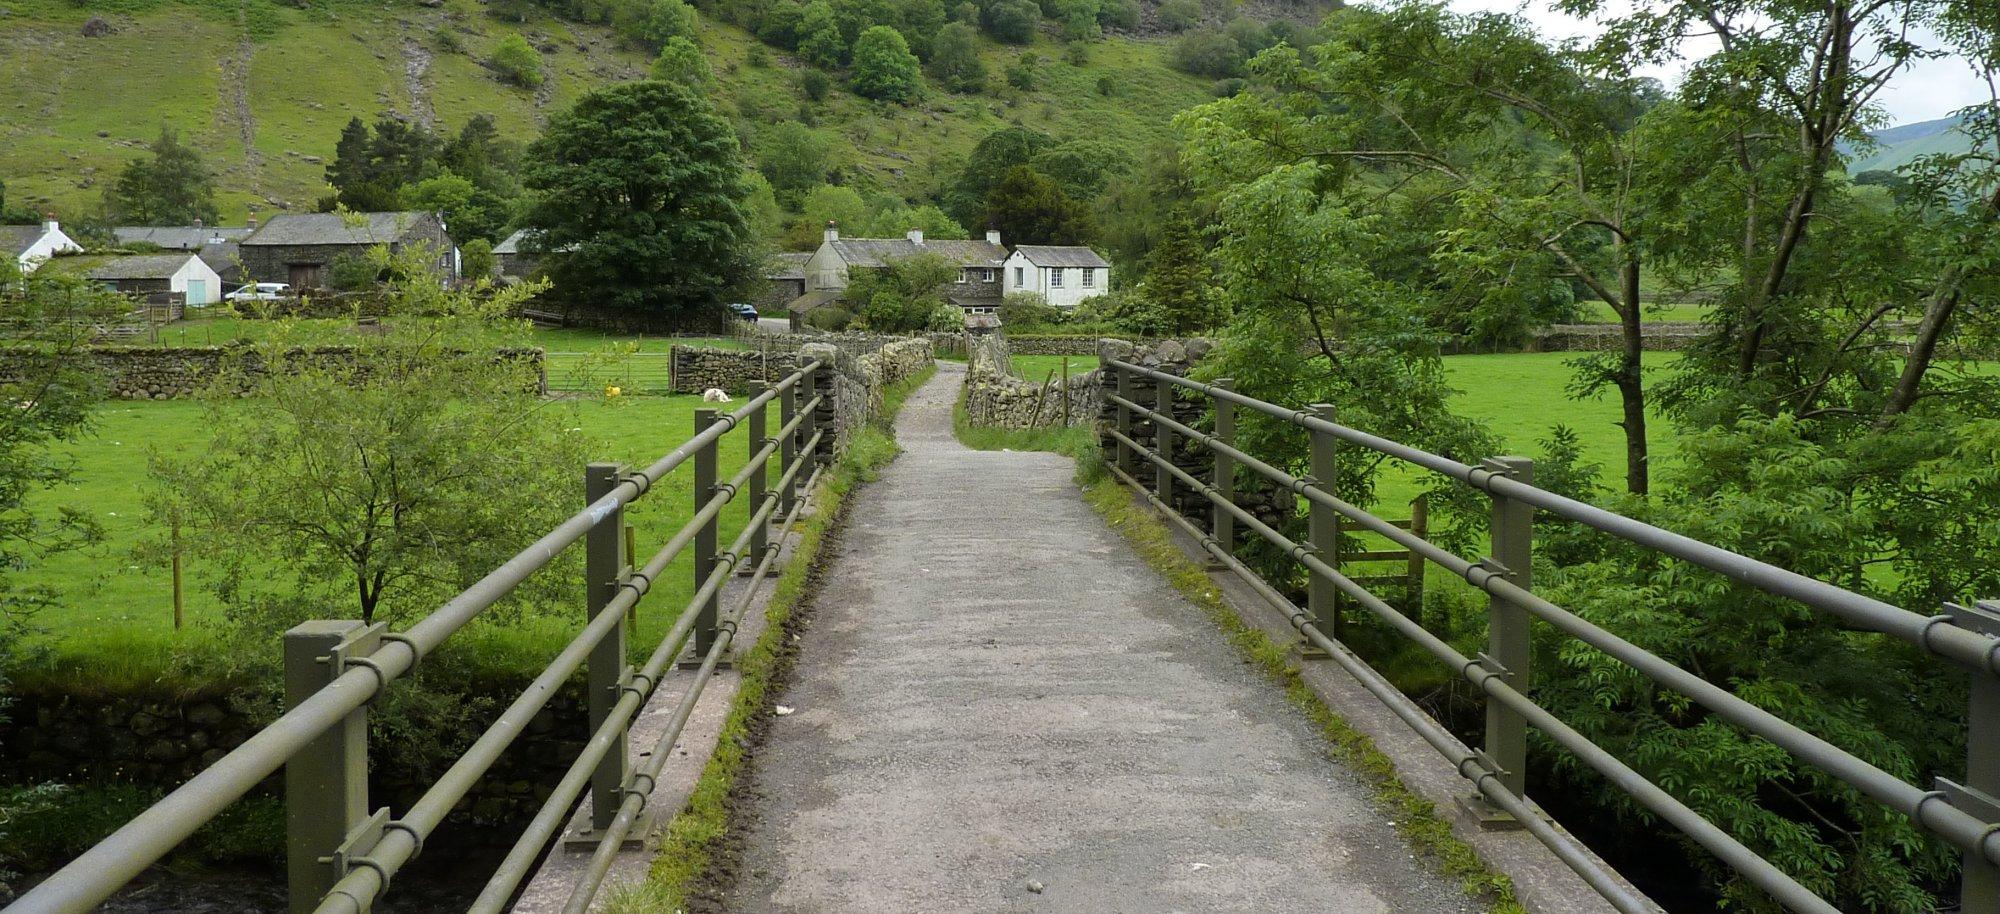 Into Stonethwaite